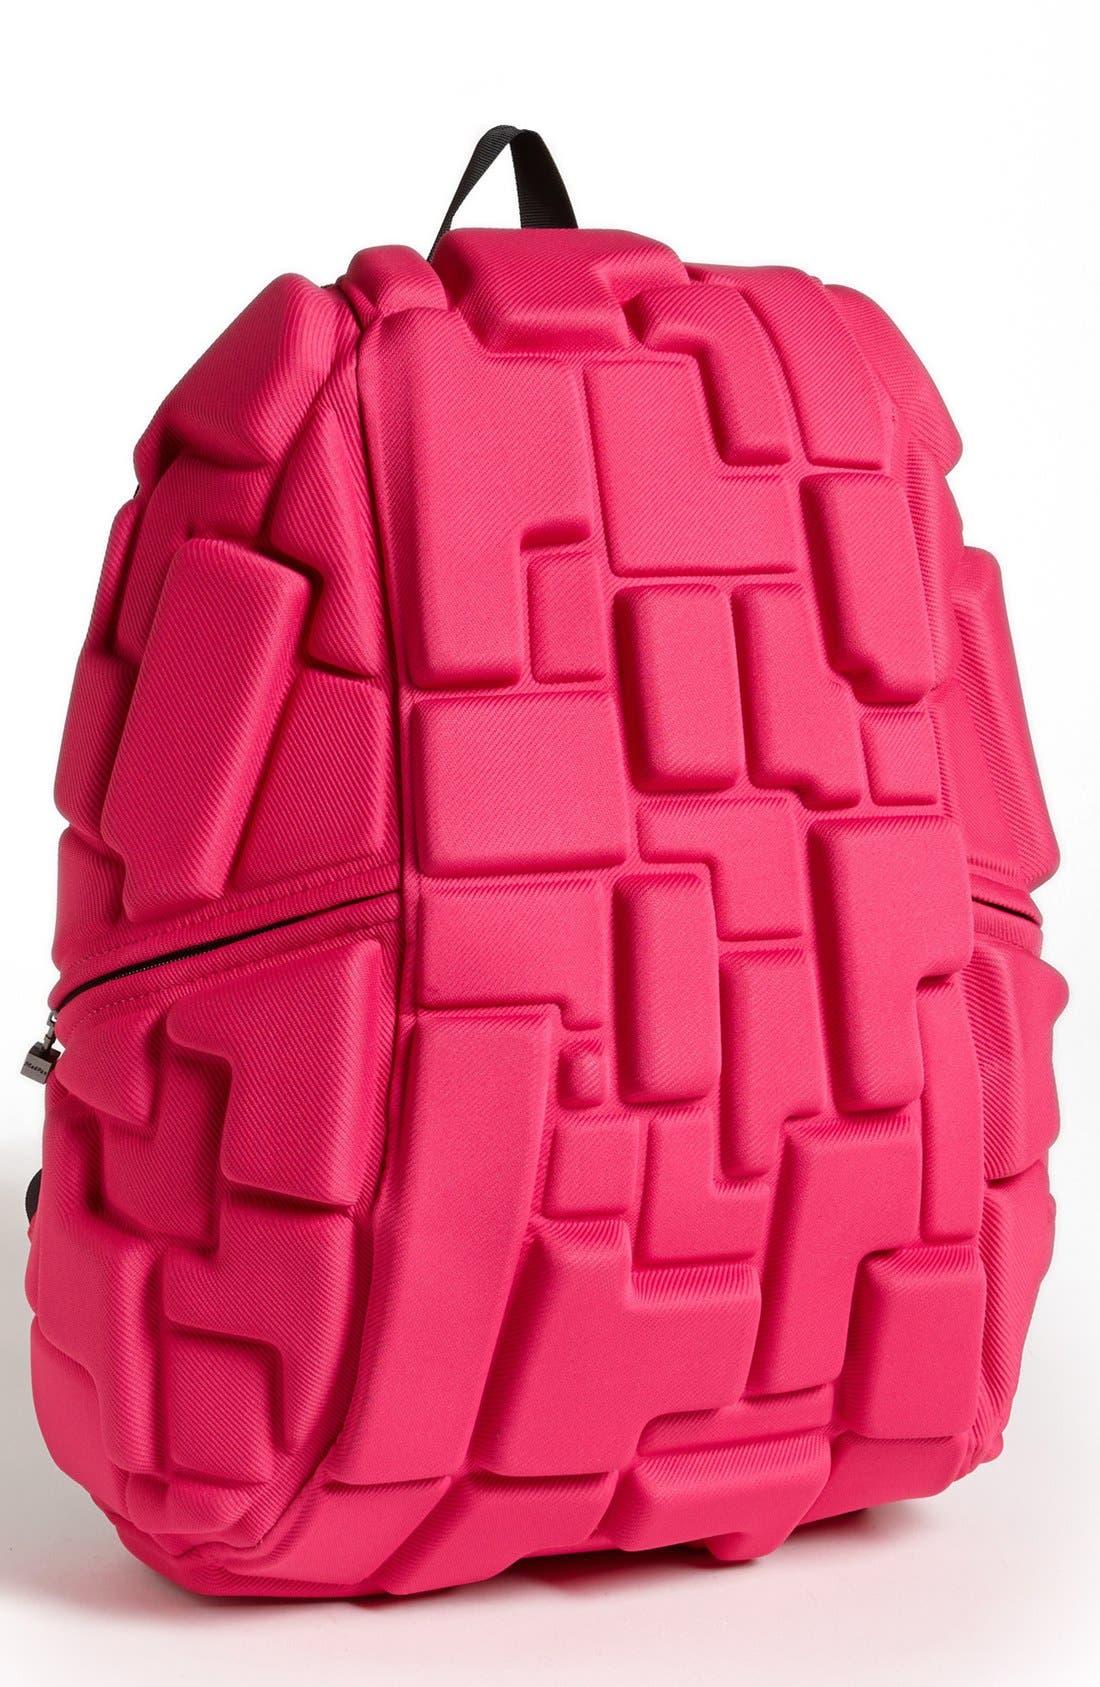 Alternate Image 1 Selected - MadPax 'Blok' Backpack (Girls)